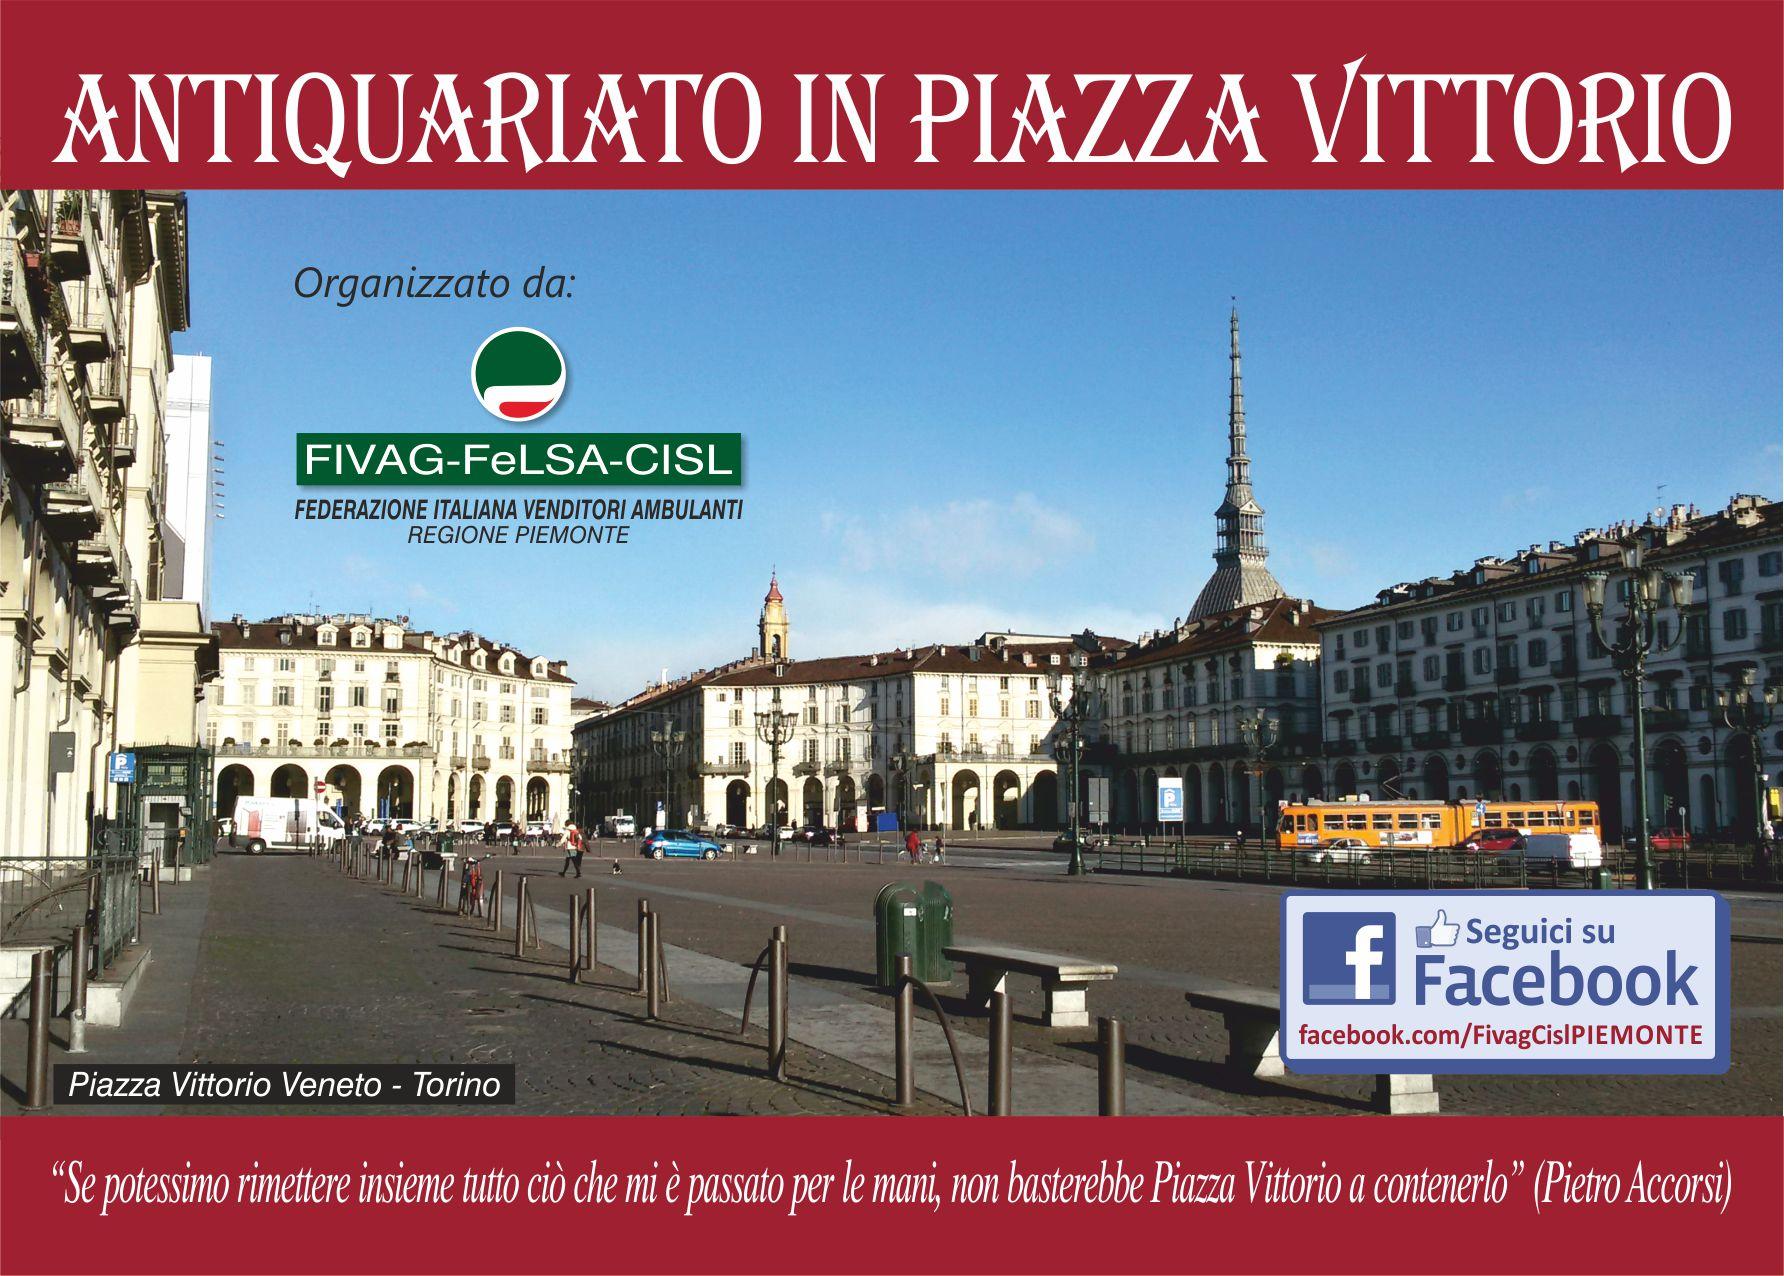 Antiquariato in piazza cartolina 2017 A